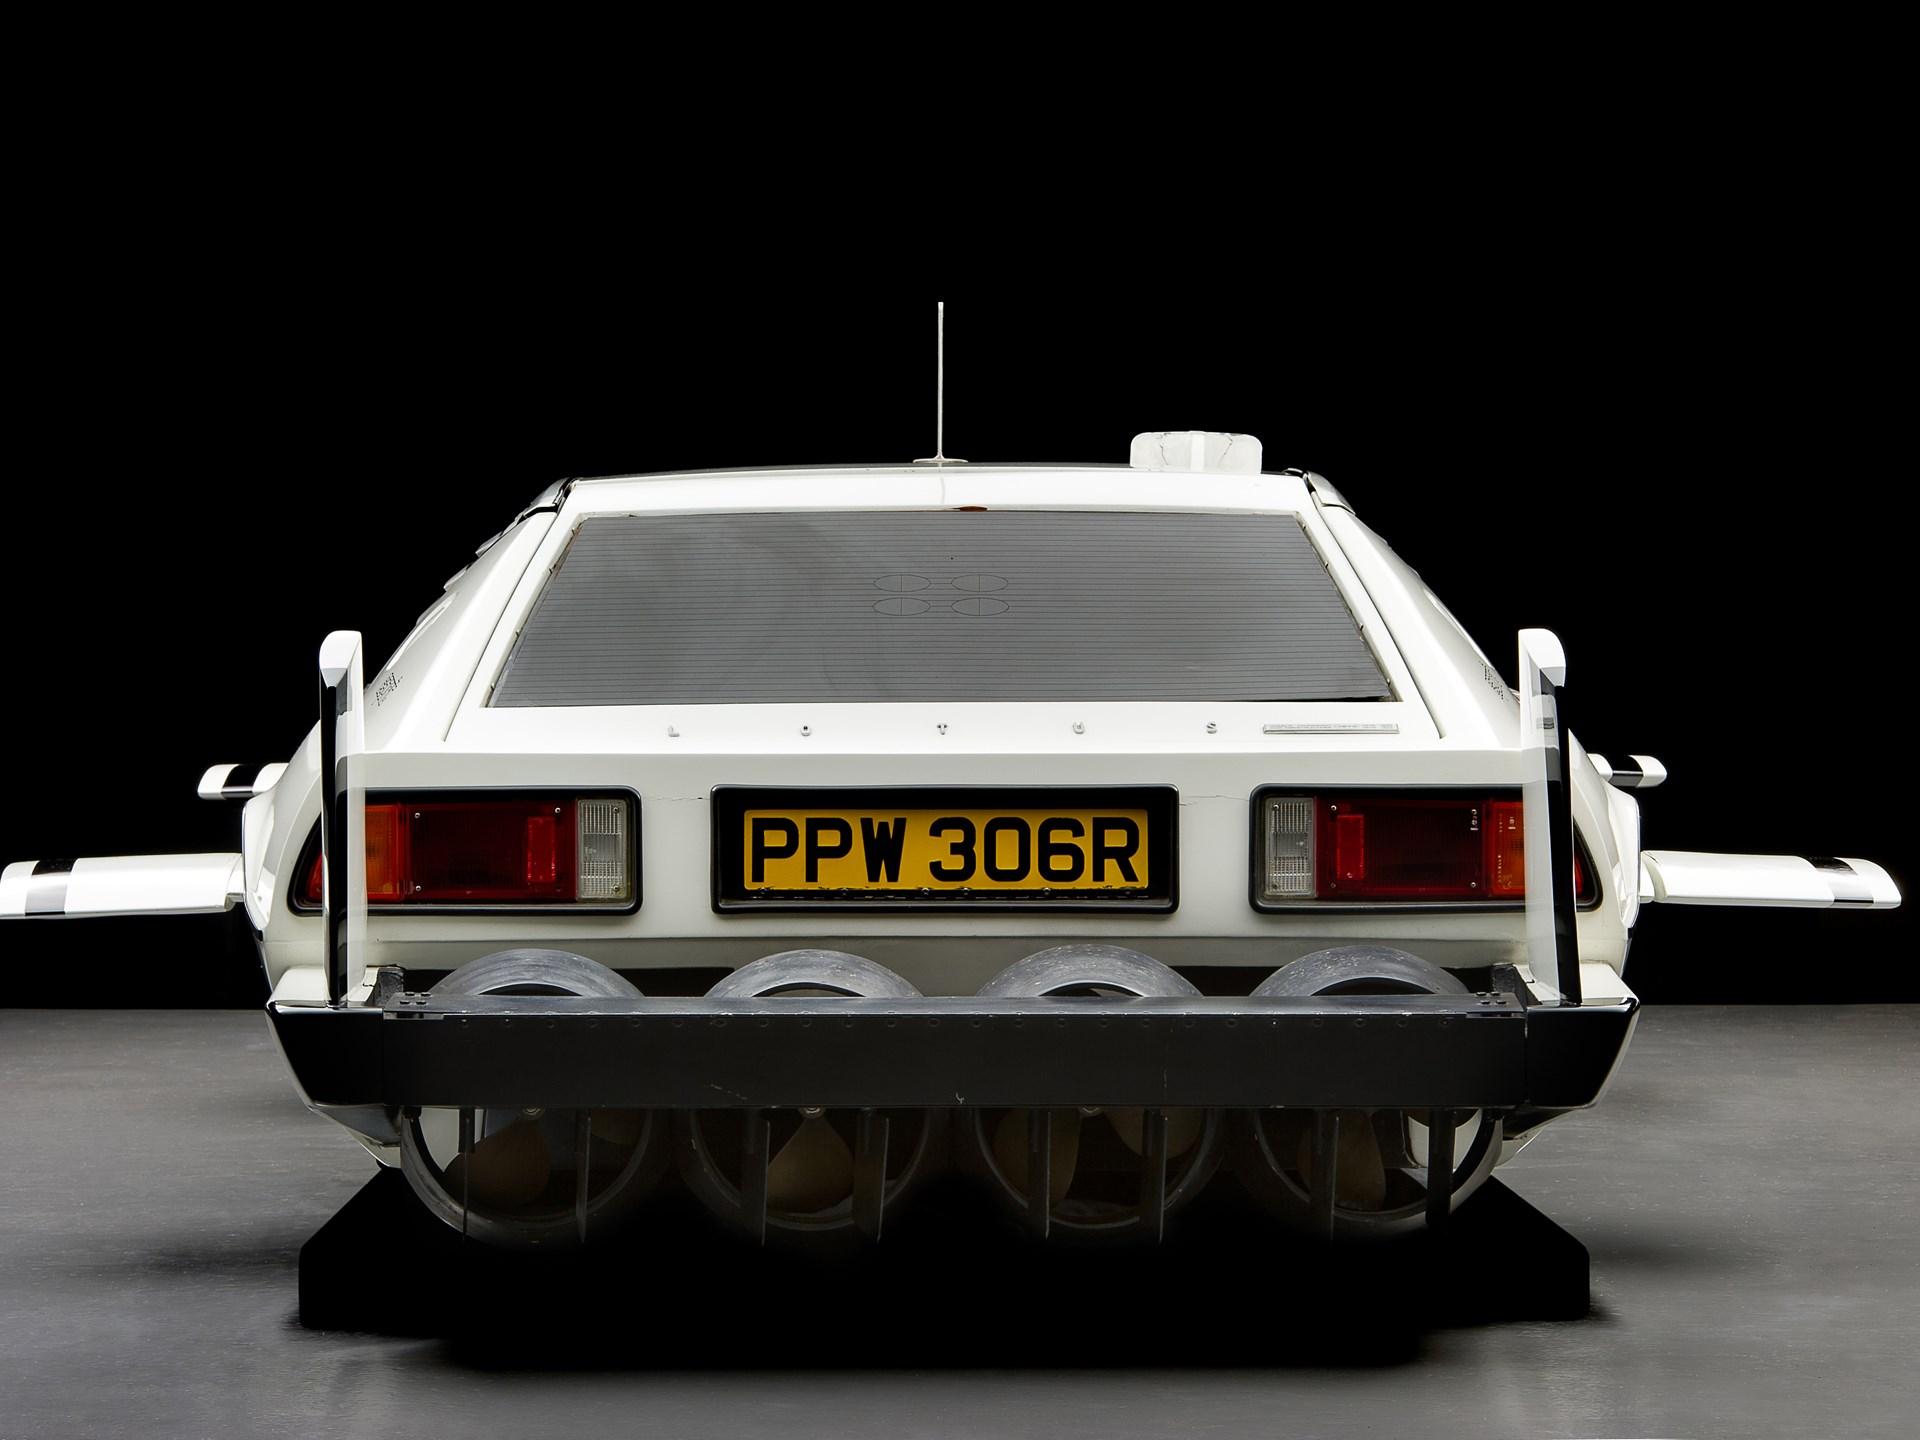 007 Lotus Esprit 'Submarine Car' rear view